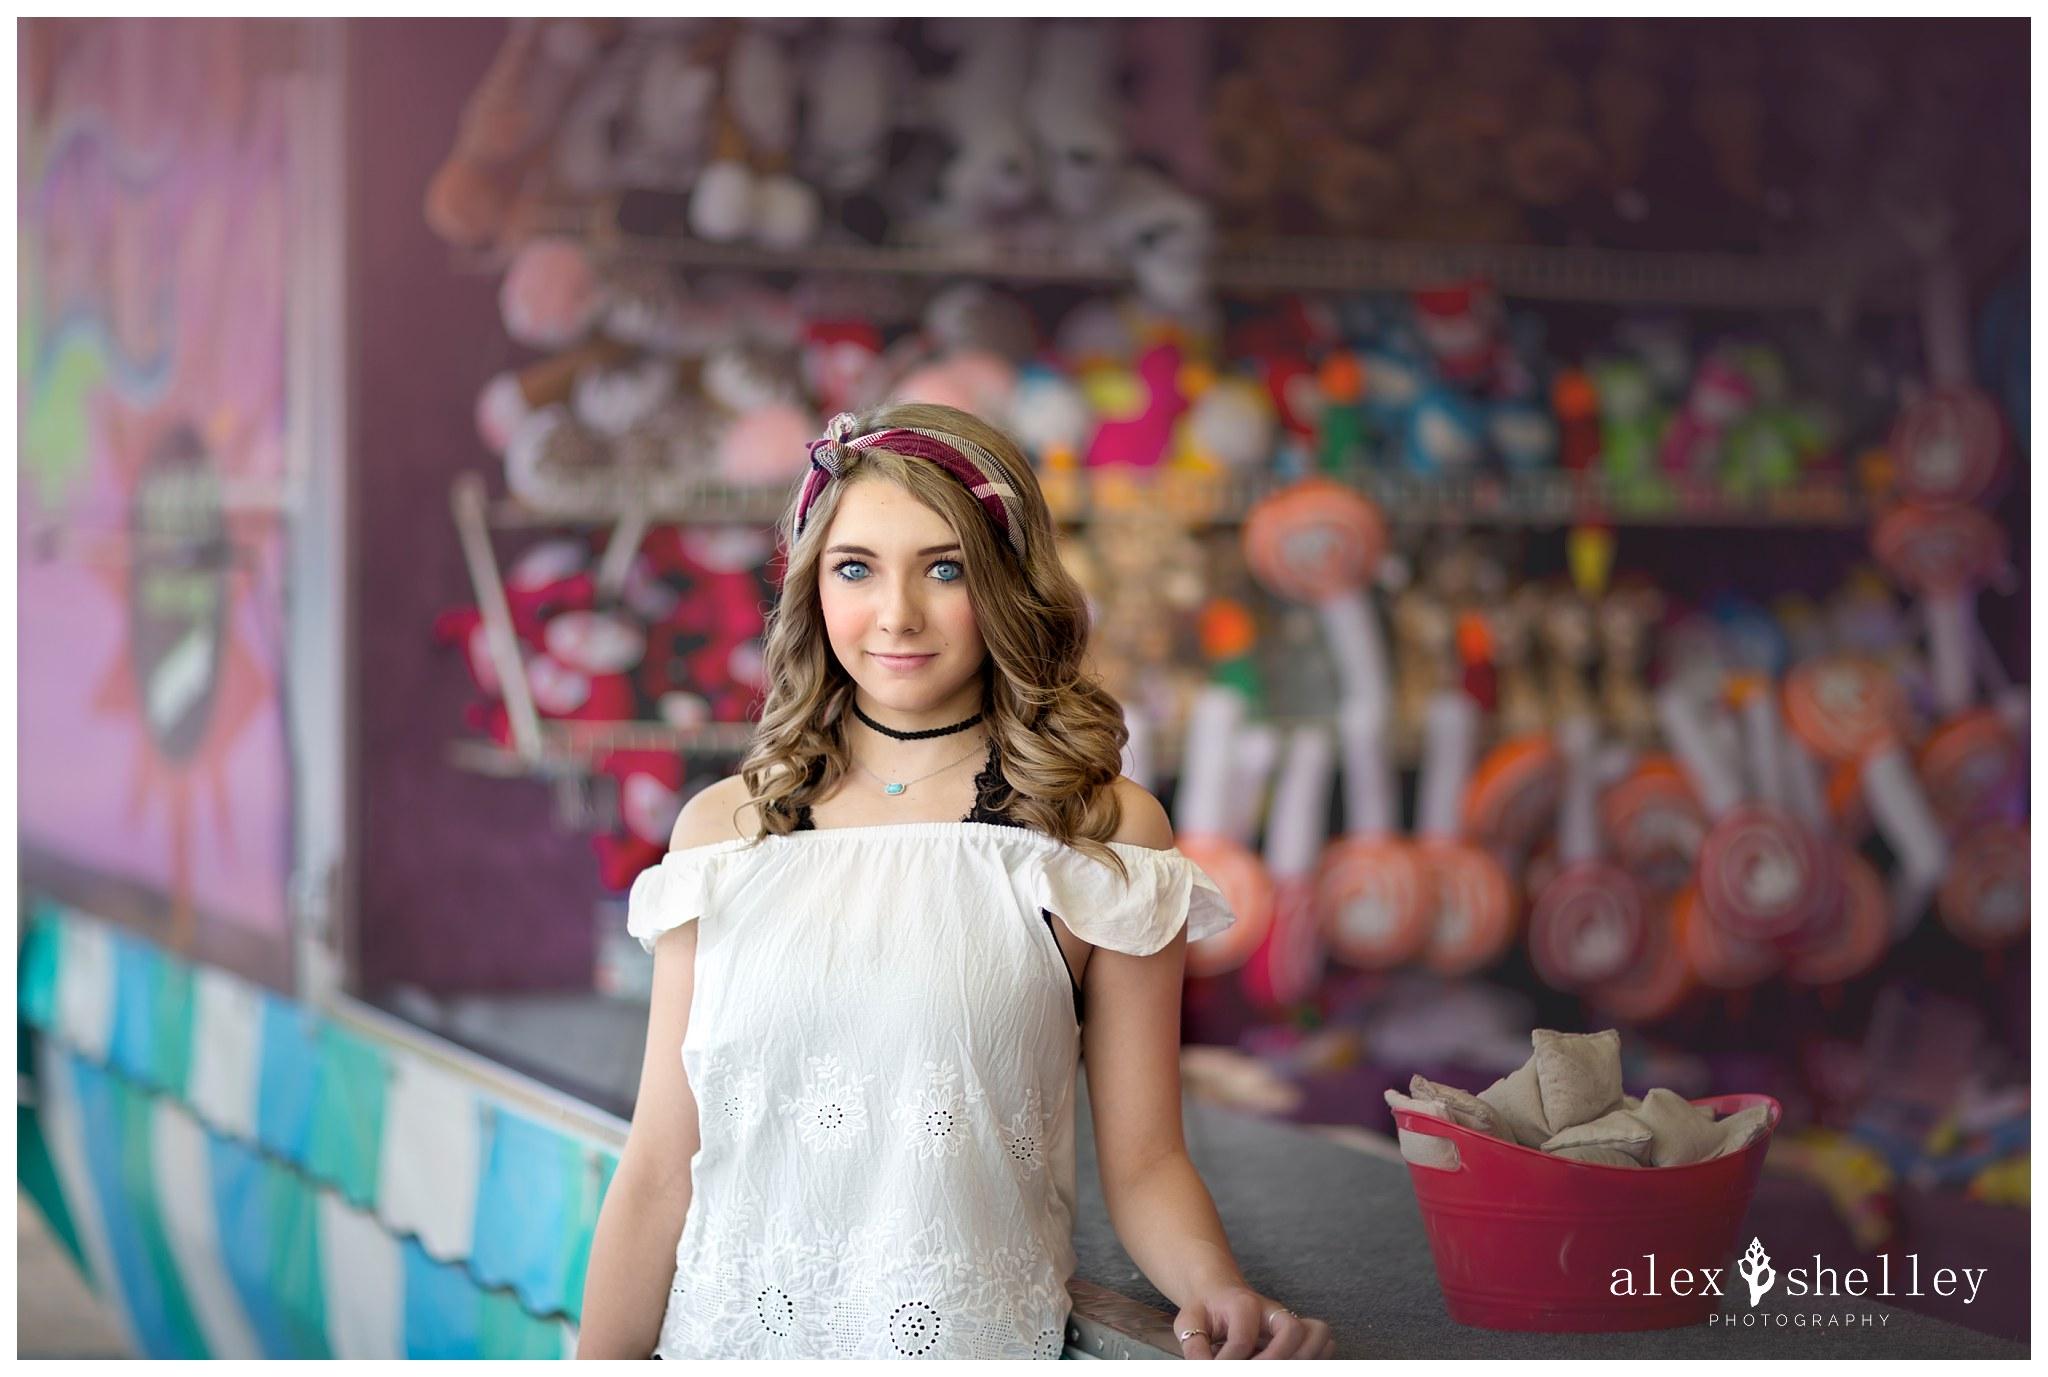 alex-shelley-senior-photos_0007